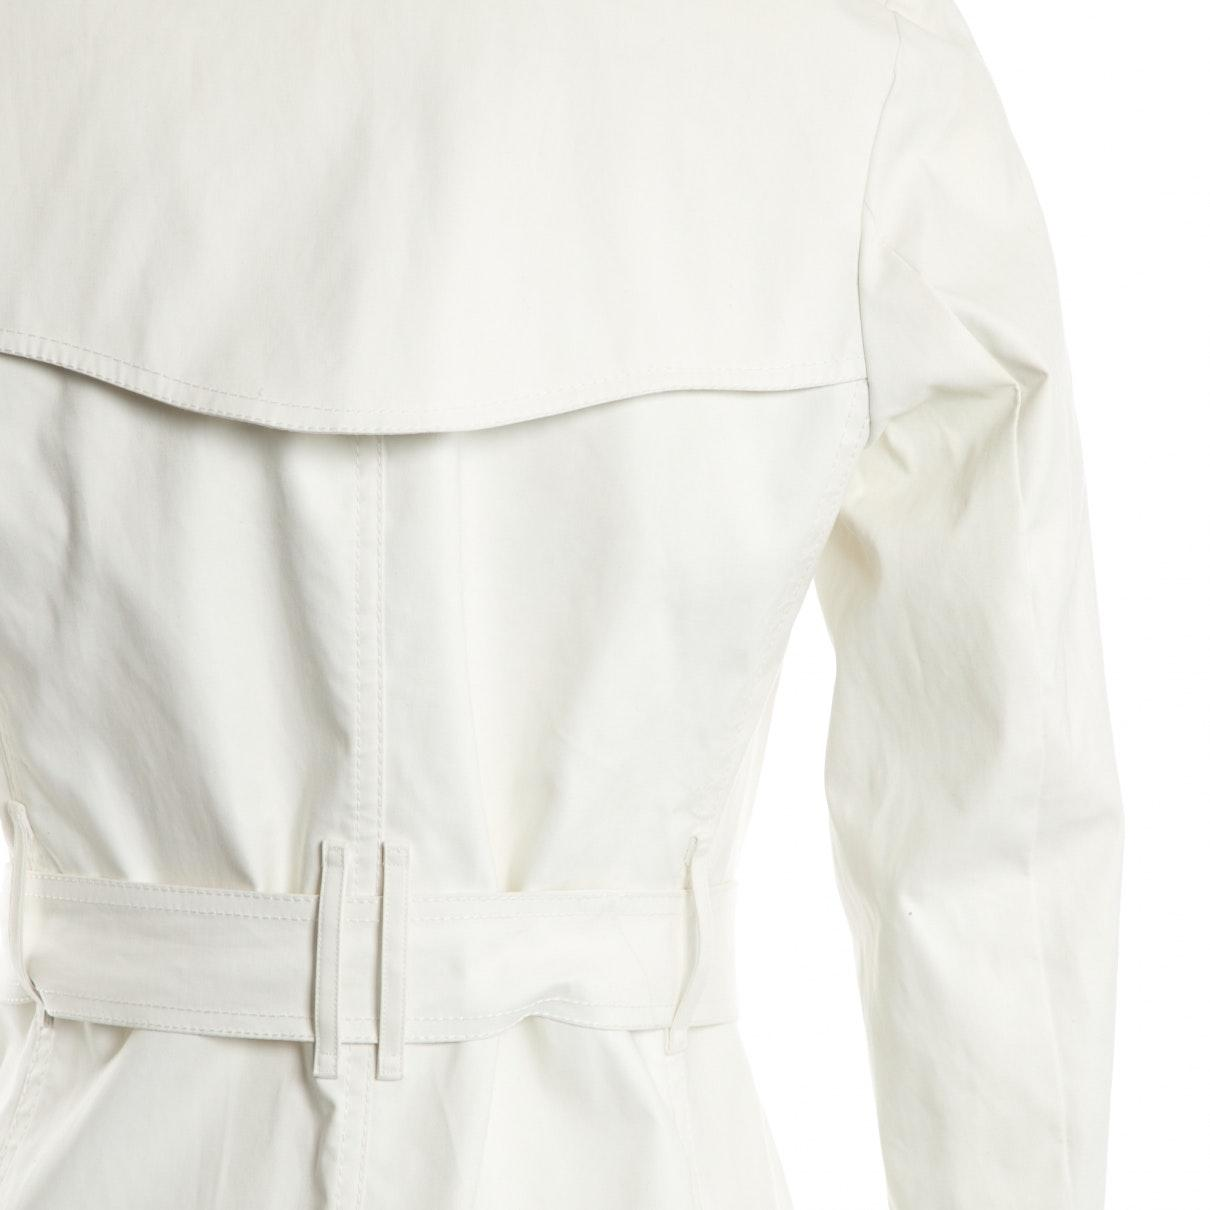 Trenchs en Coton Écru Coton Burberry en coloris Blanc